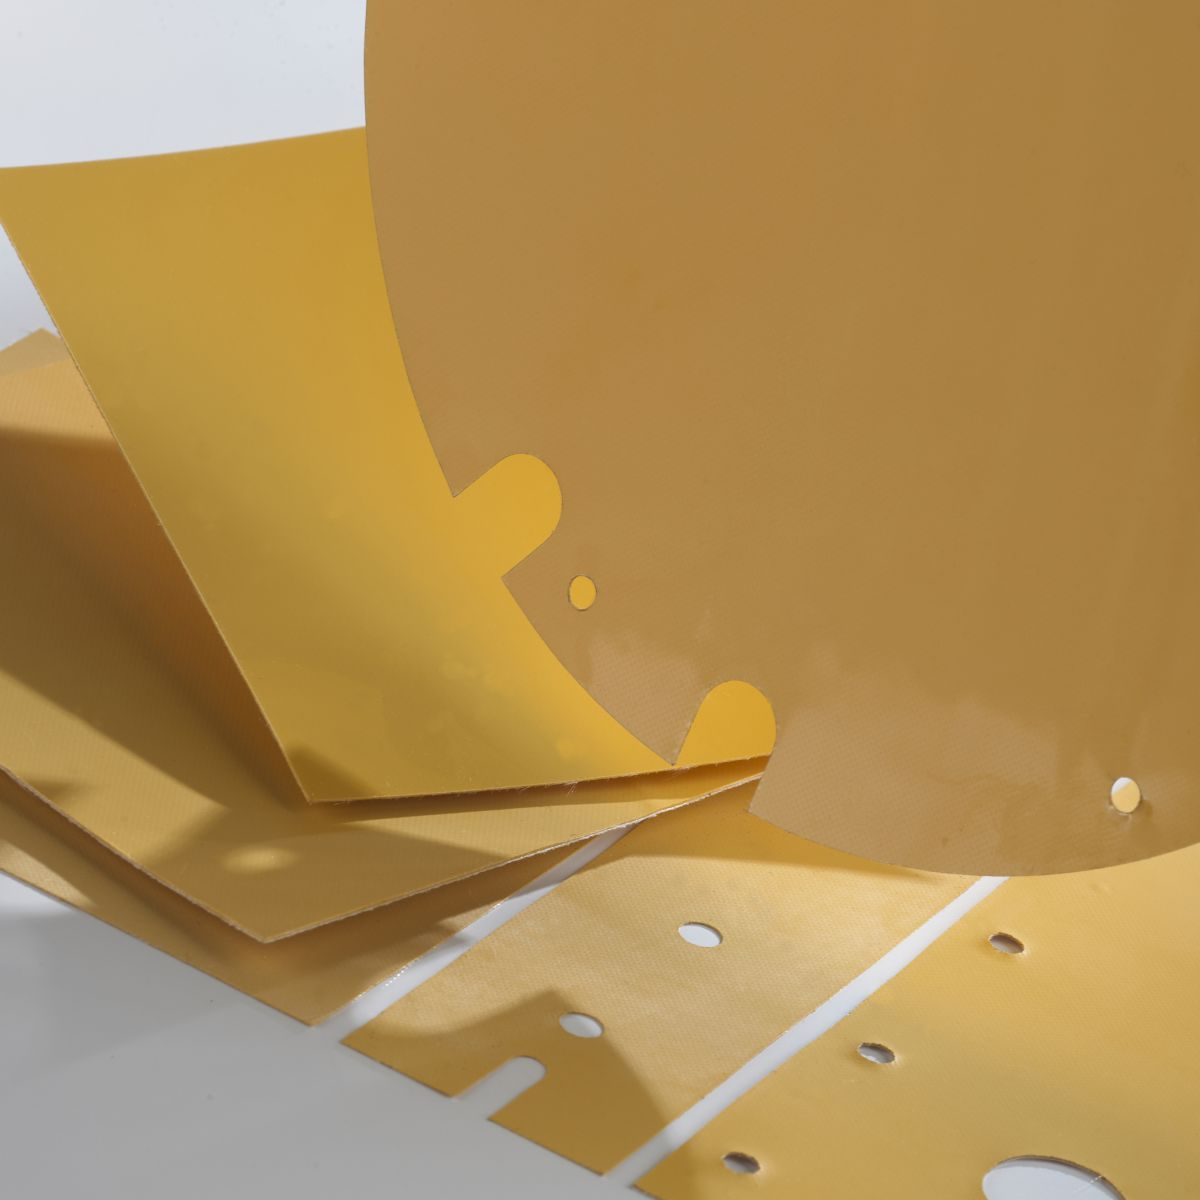 15 wmk orange thermal conductive film